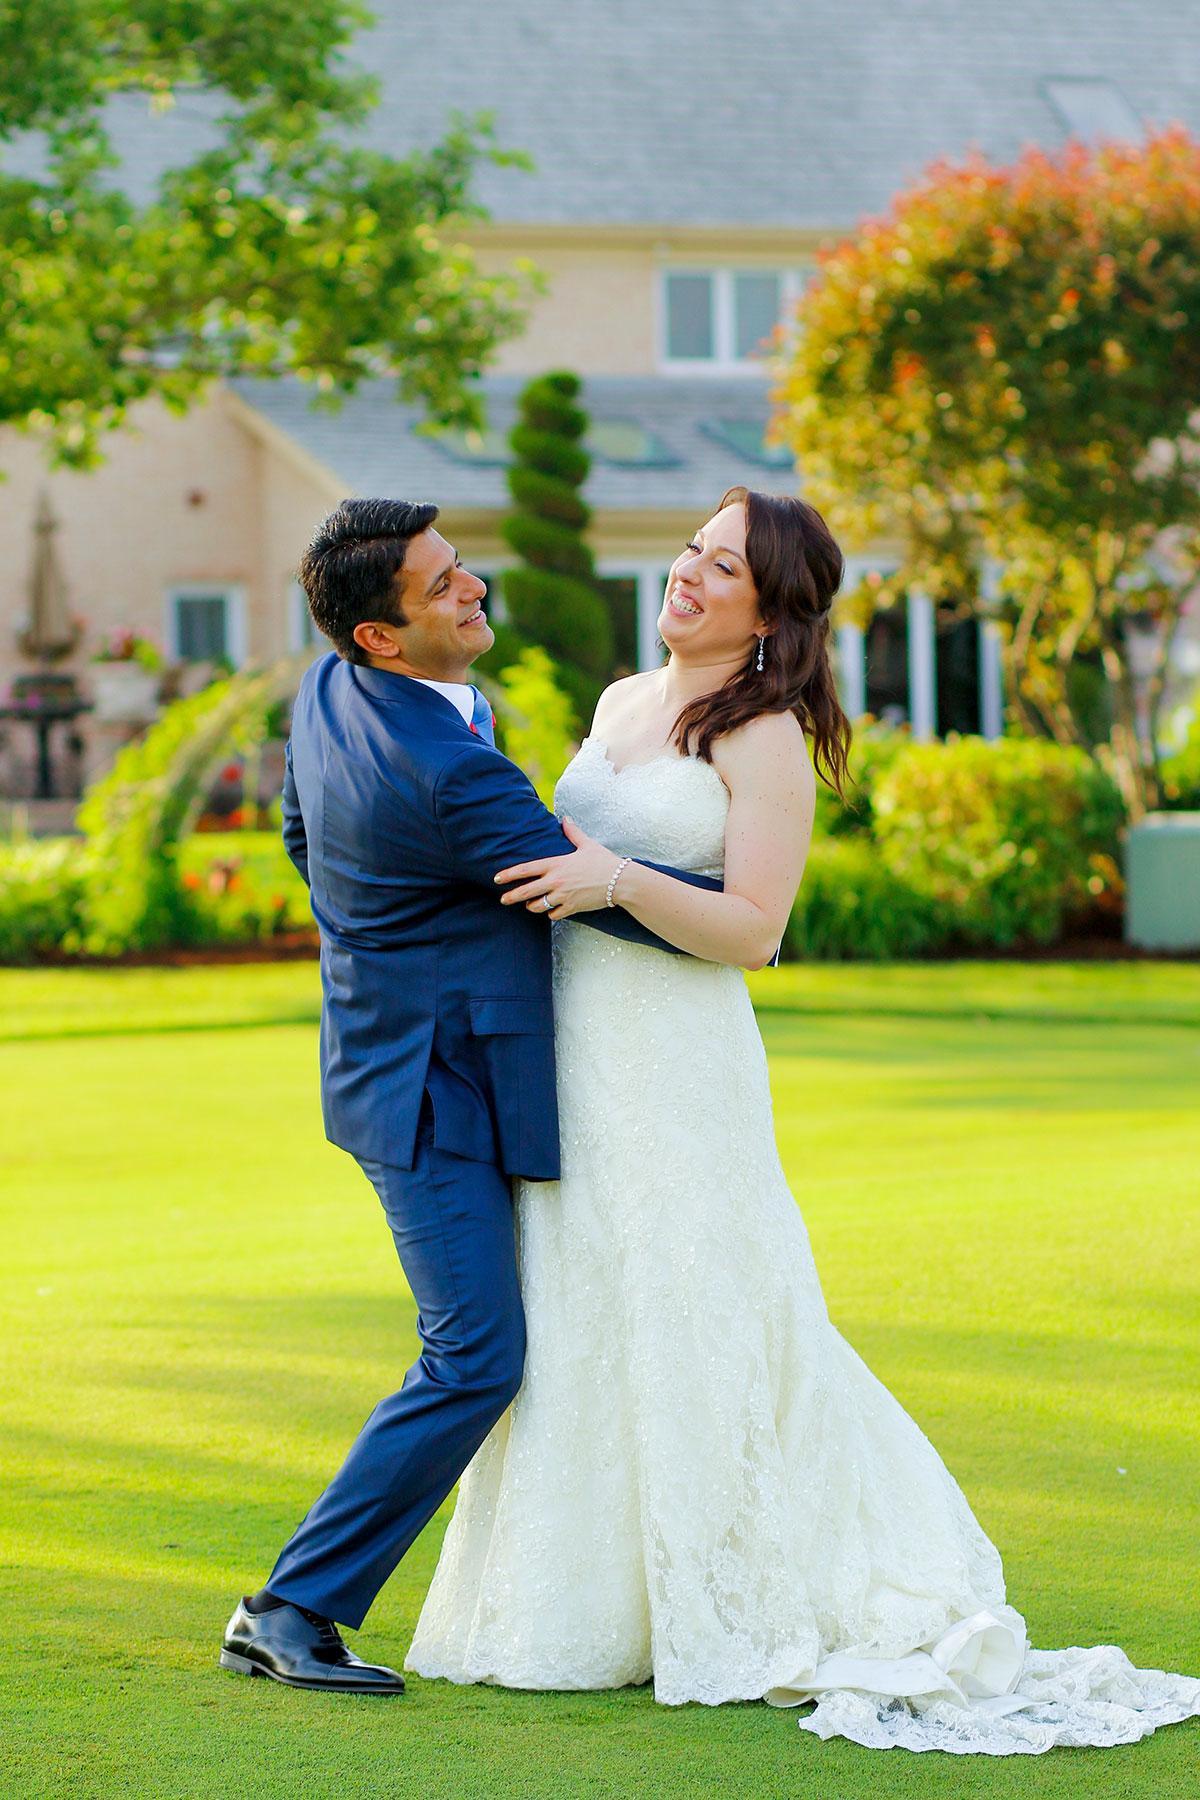 Wedding_Chicago_Anurag_Christine_17.JPG